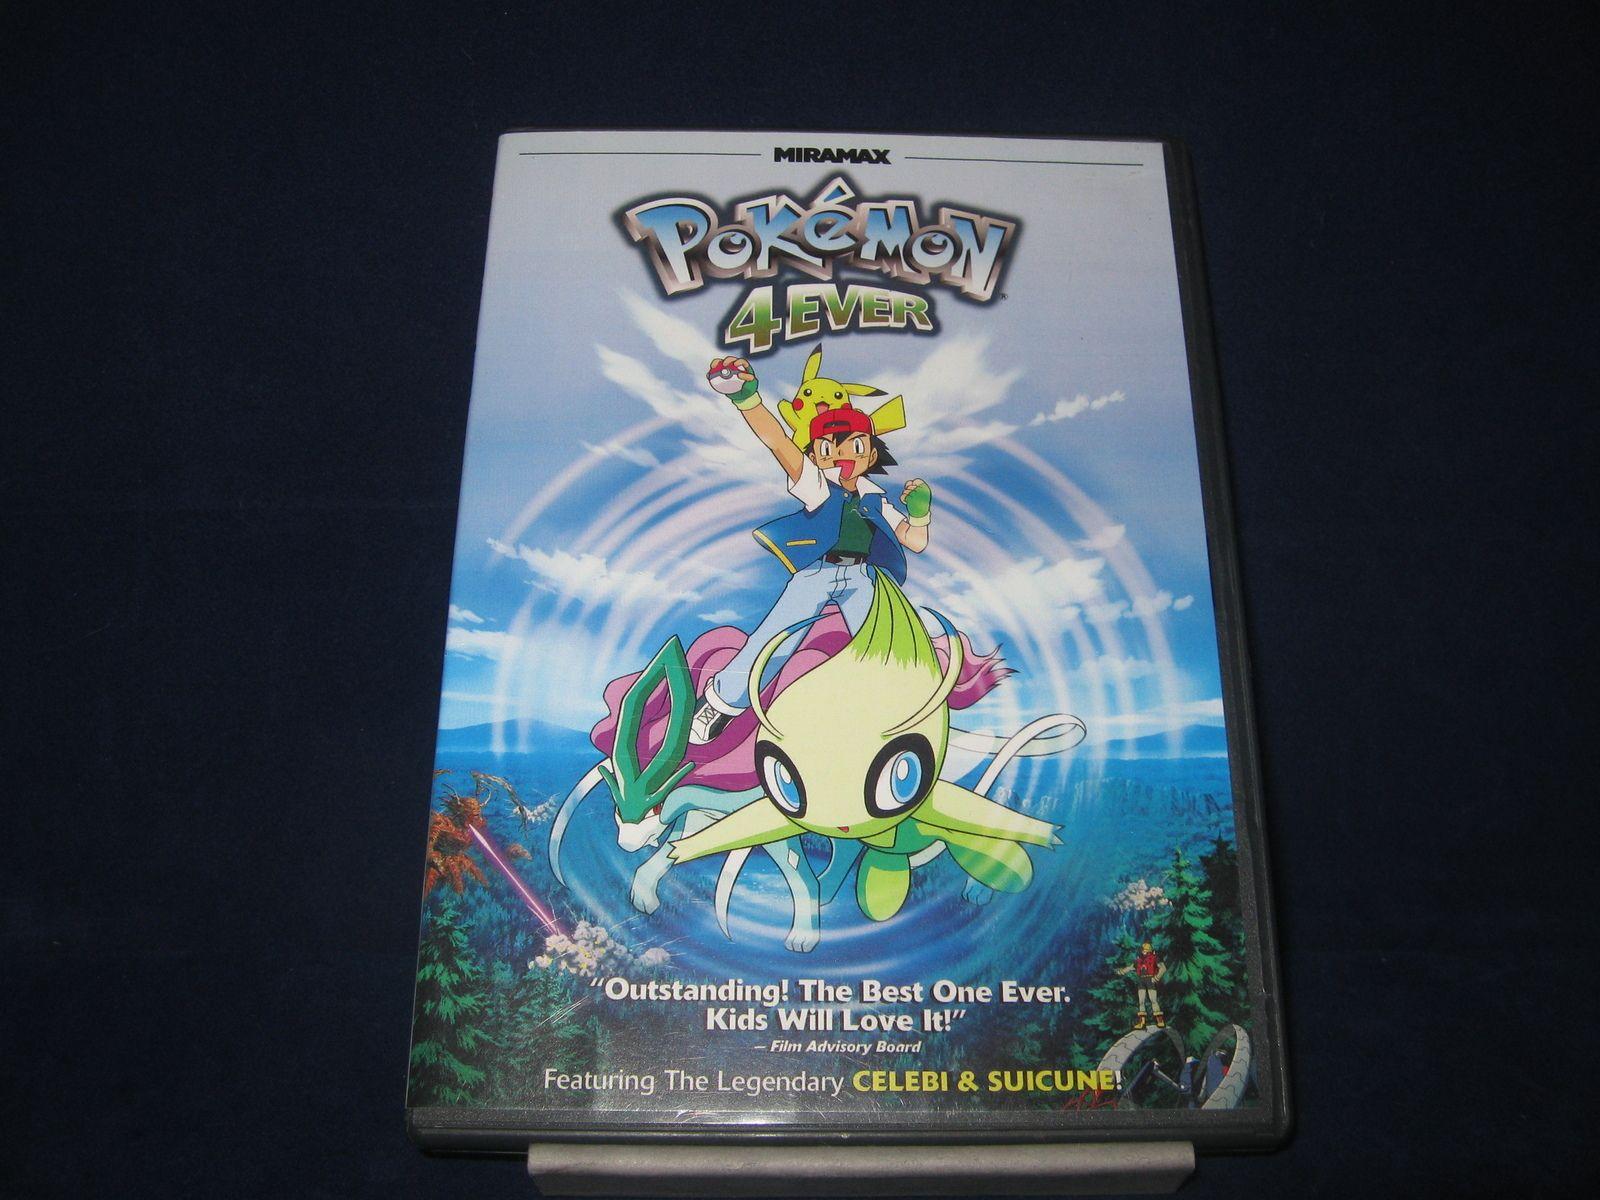 Pokemon 4ever Dvd Movie Video Anime Animation Celebi